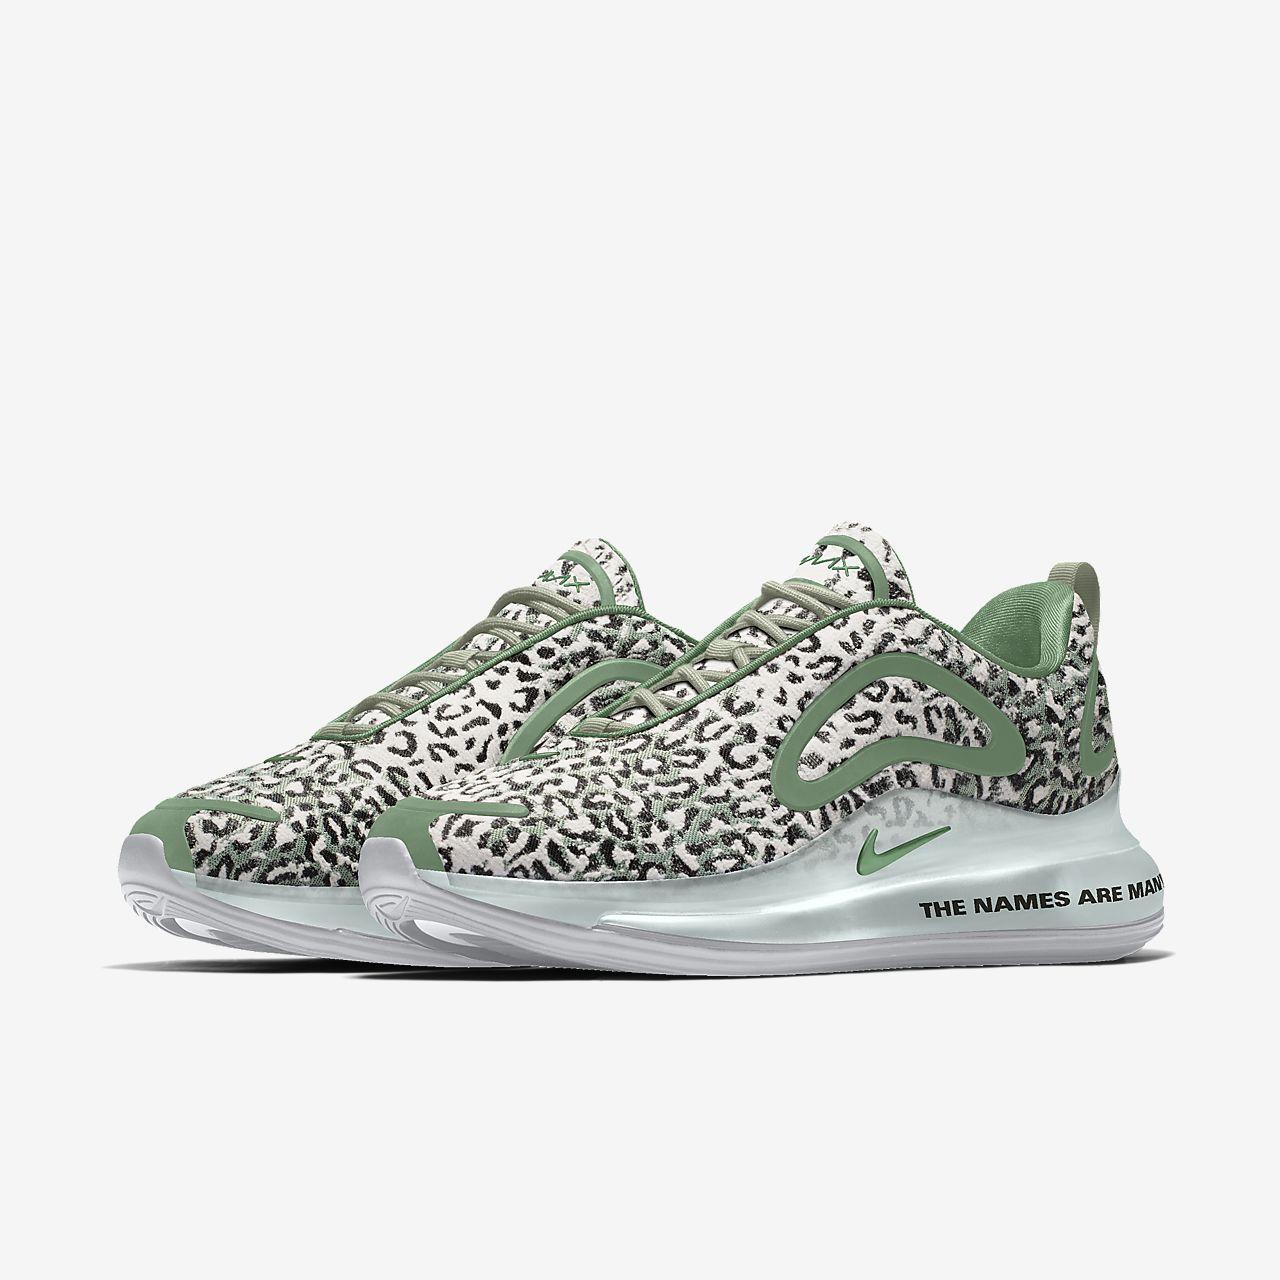 Nike By You Custom Shoes. Nike HR